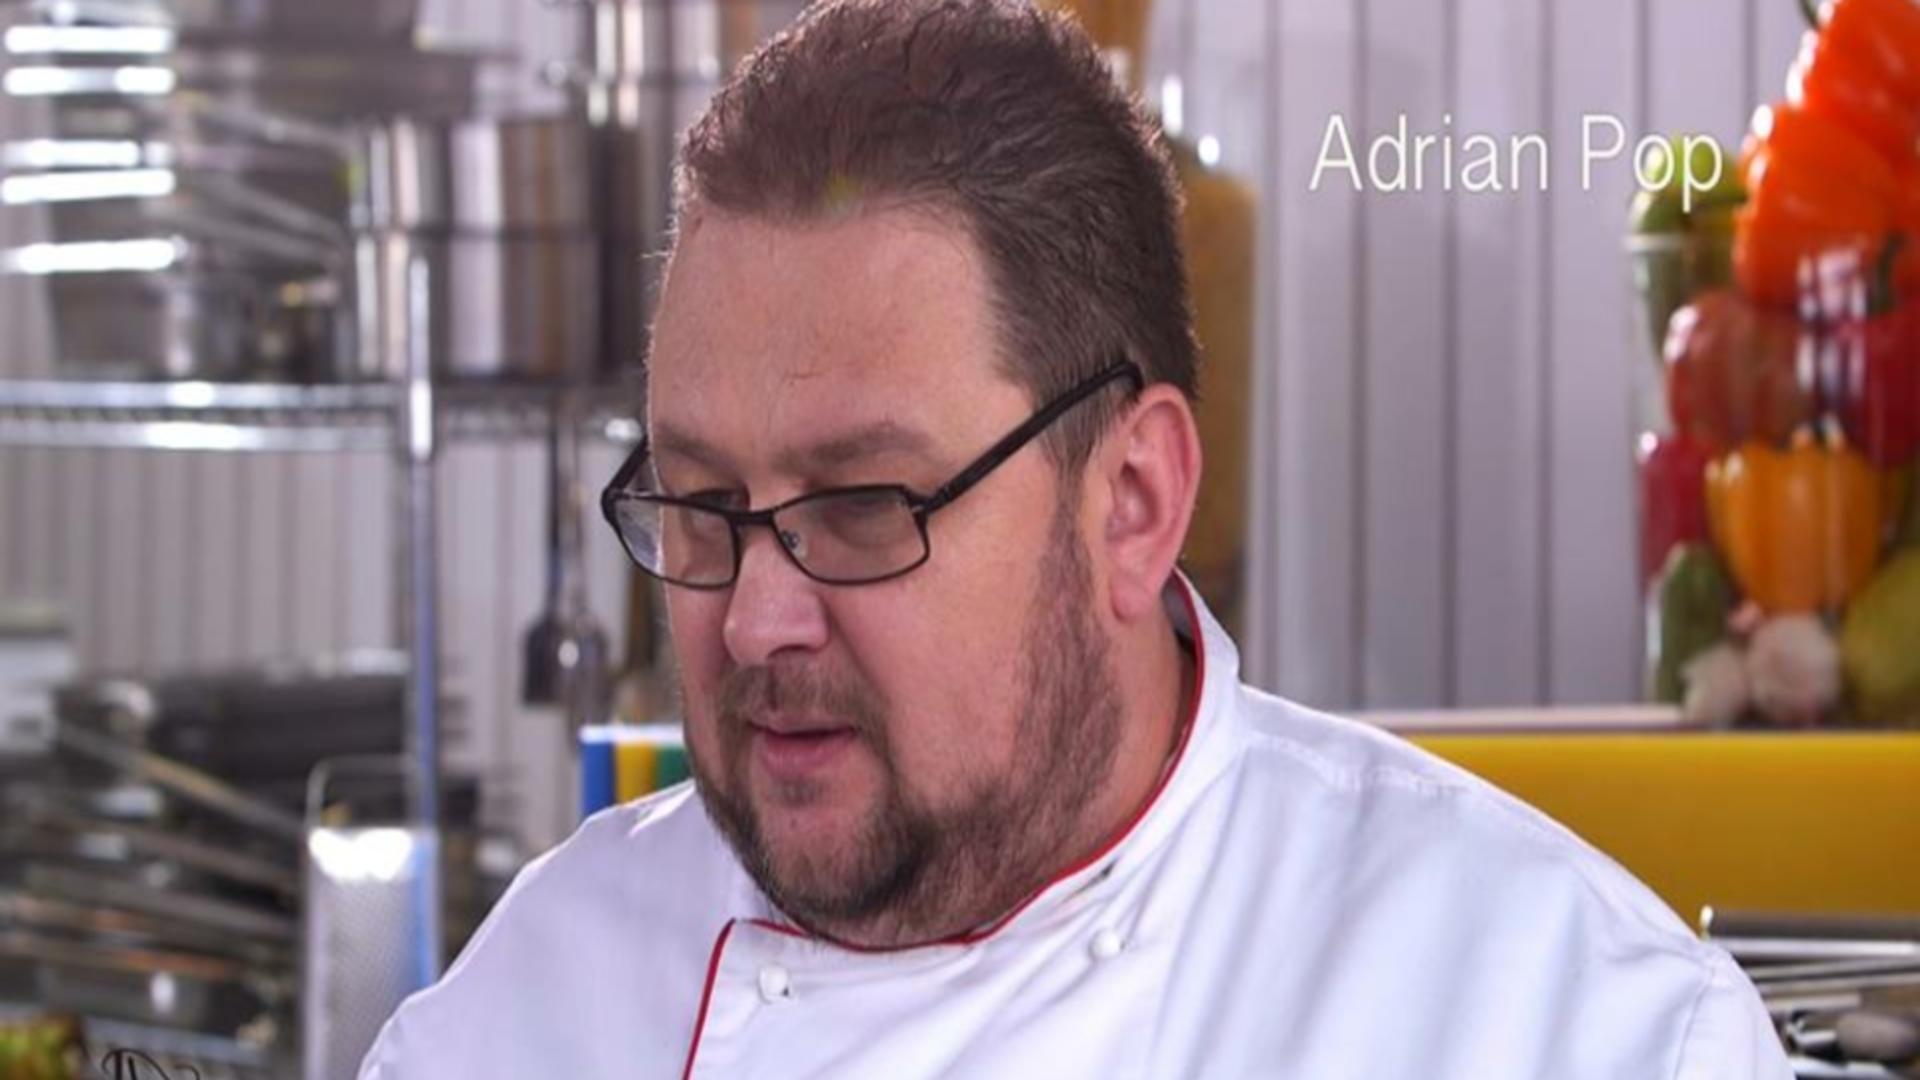 Chef Adrian Pop